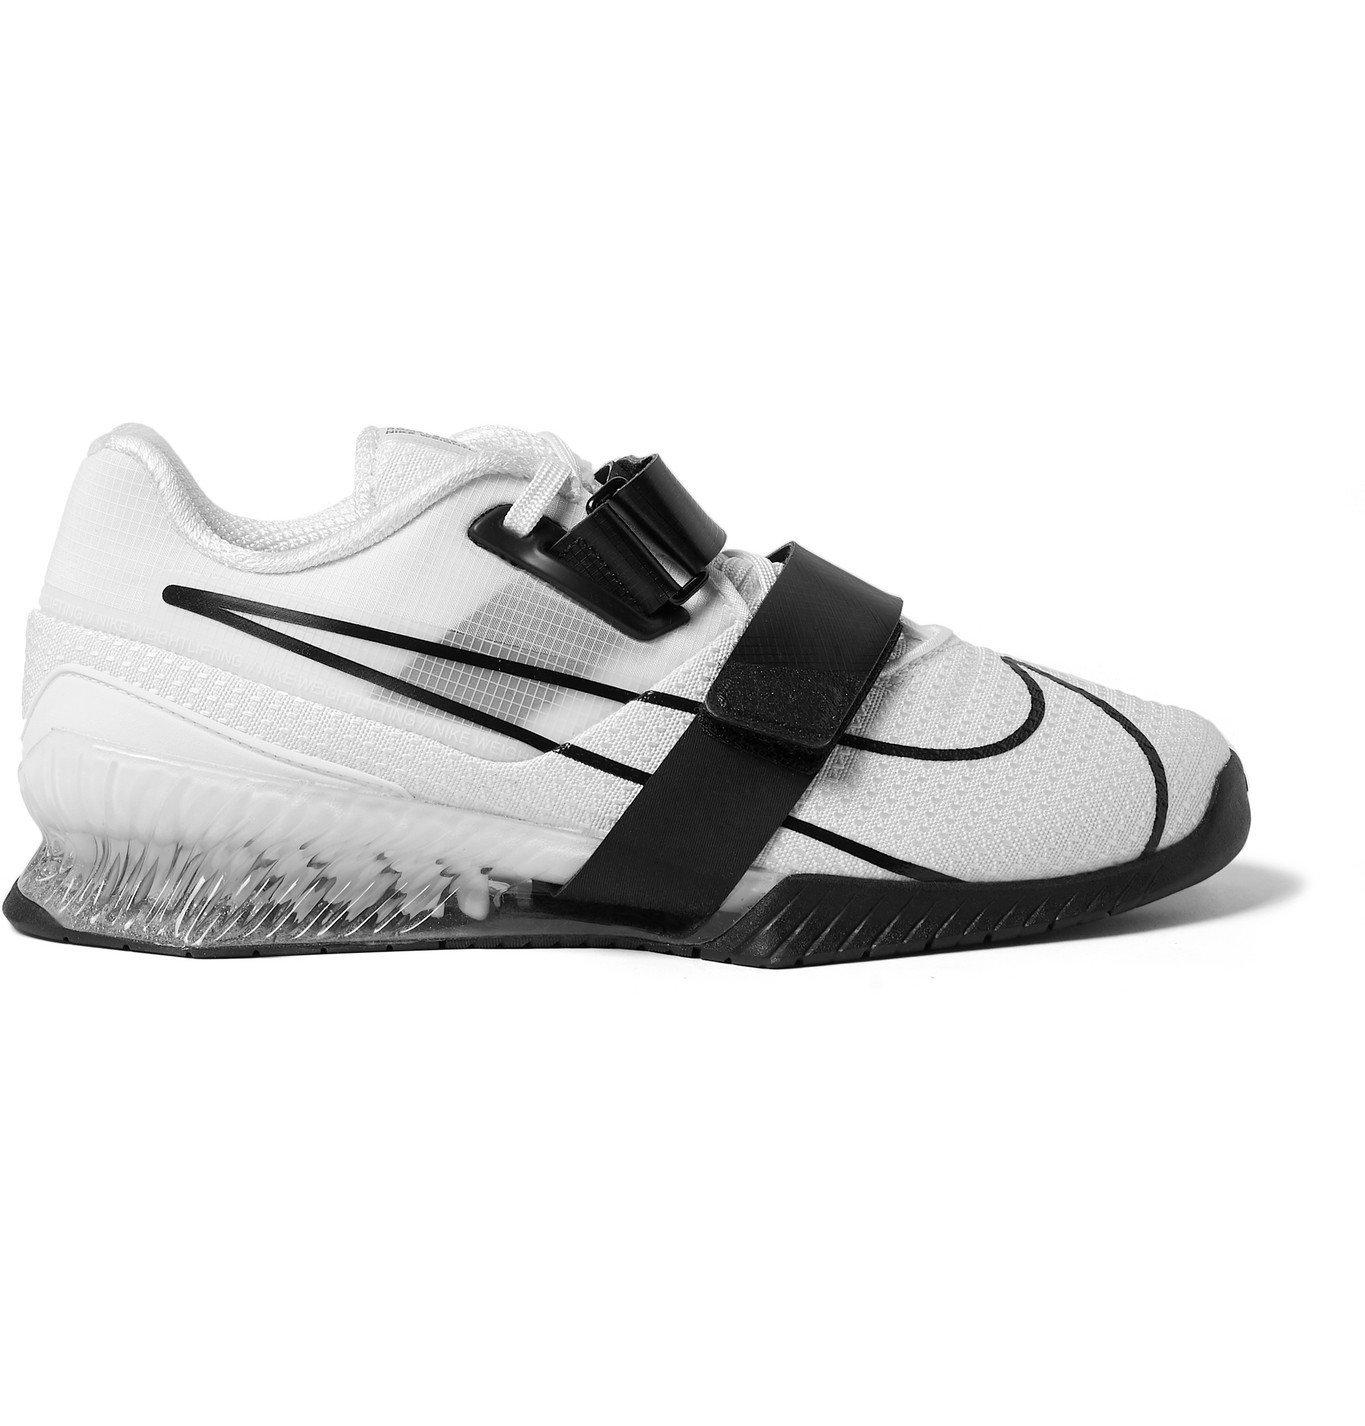 Photo: Nike Training - Romaleos 4 Ripstop and Mesh Sneakers - White